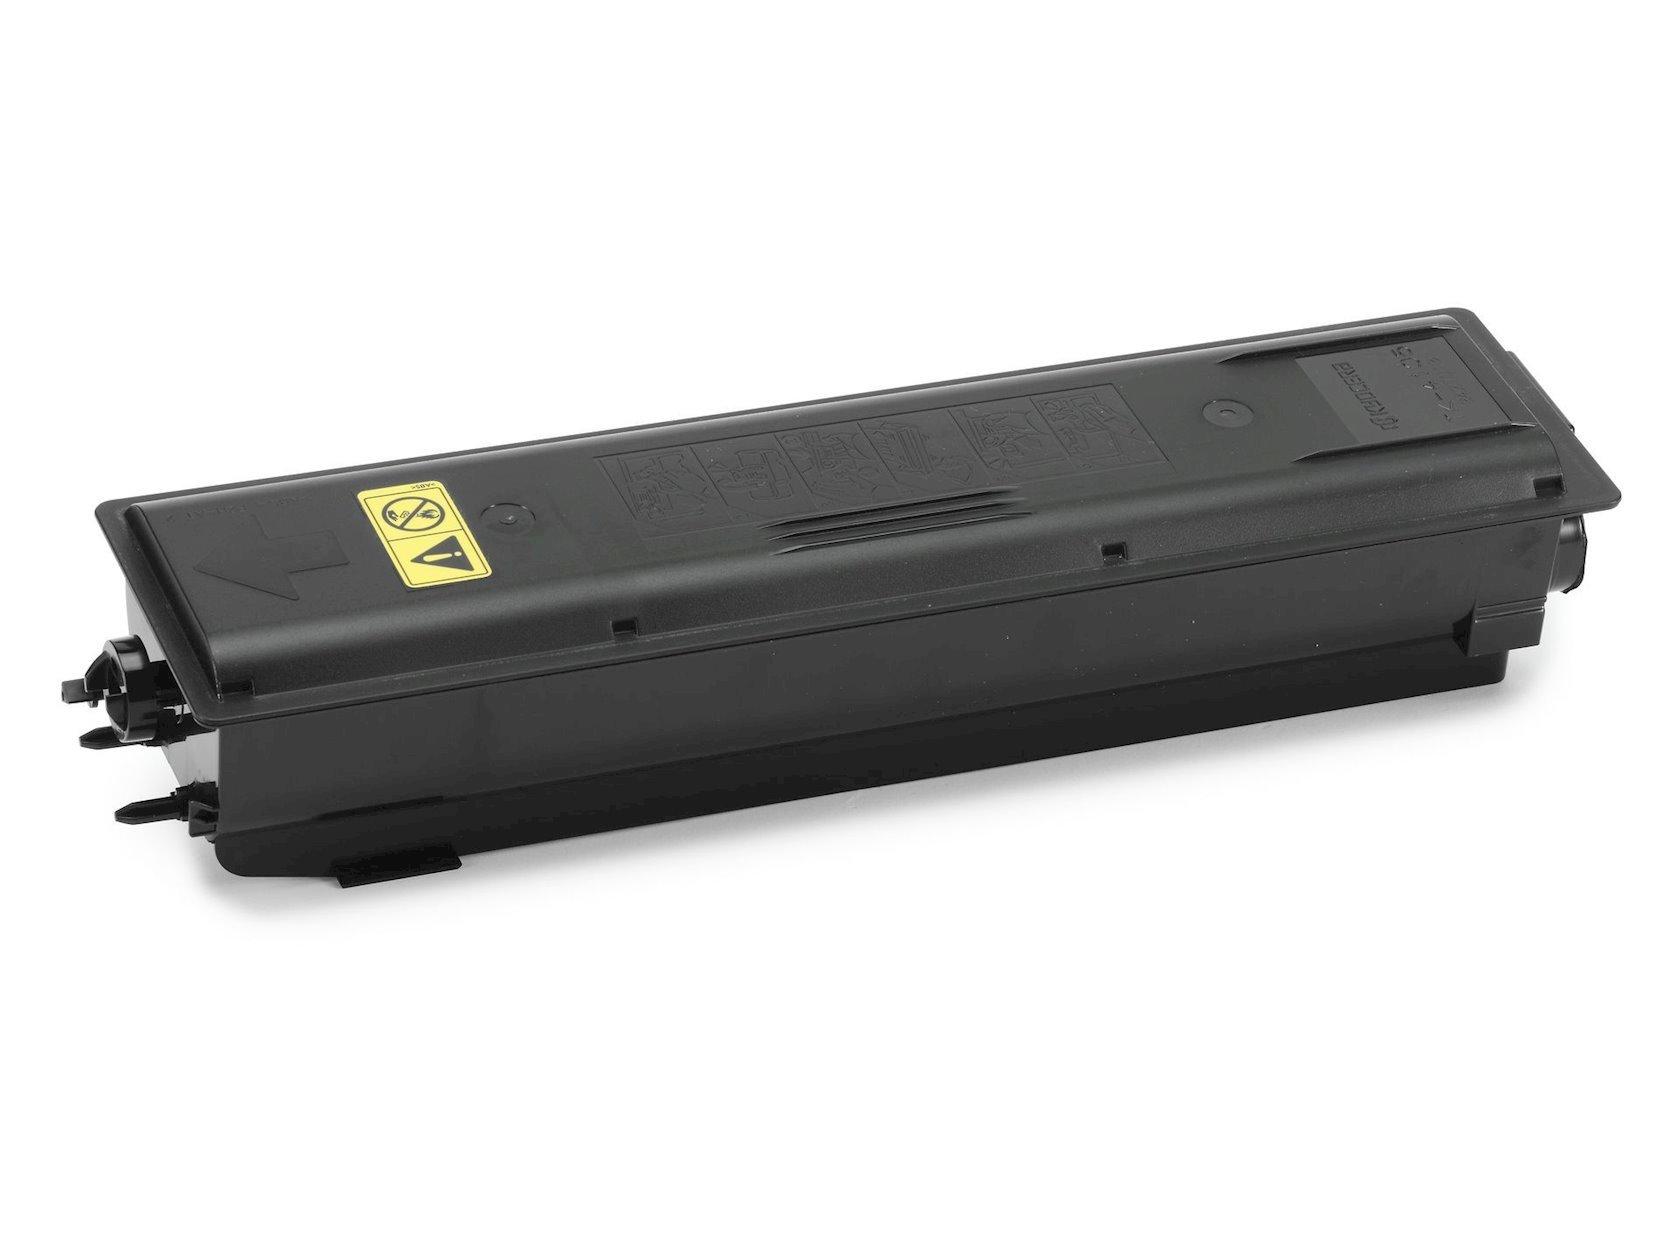 Toner-kartric Kyocera TK-4105 Qara